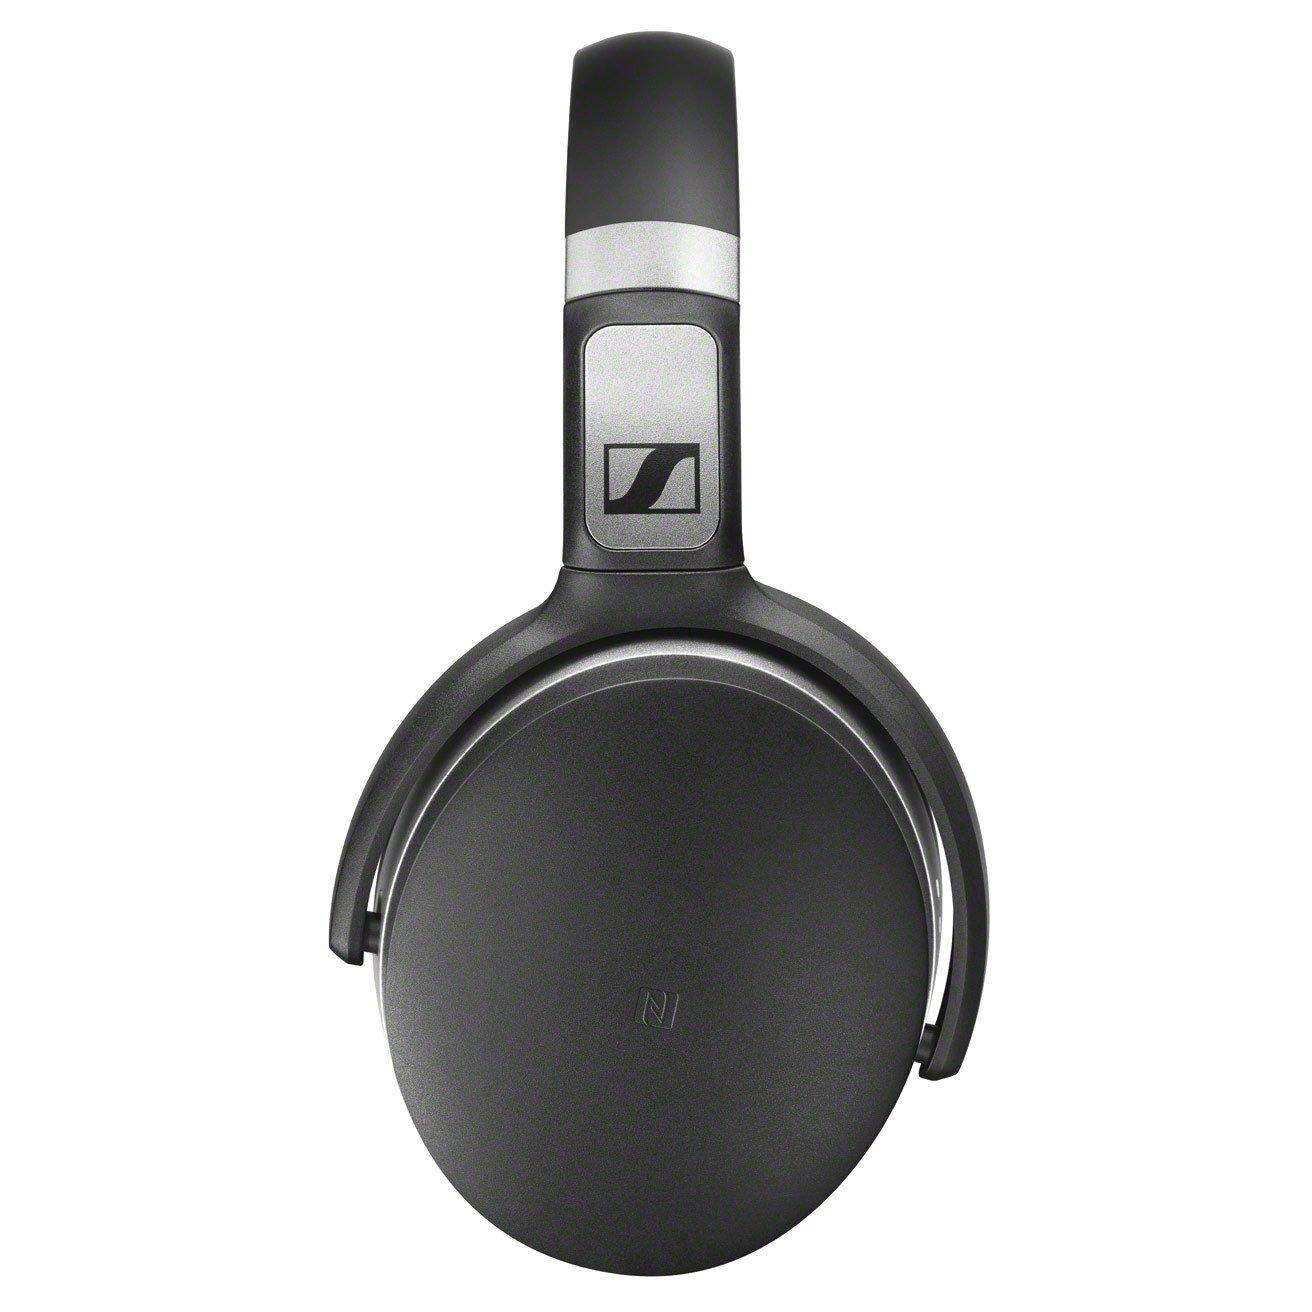 SENNHEISER-森海塞尔 HD4.50BTNC WIRELESS 头戴式降噪无线蓝牙耳机重低音手机音乐耳麦HIFI发烧友